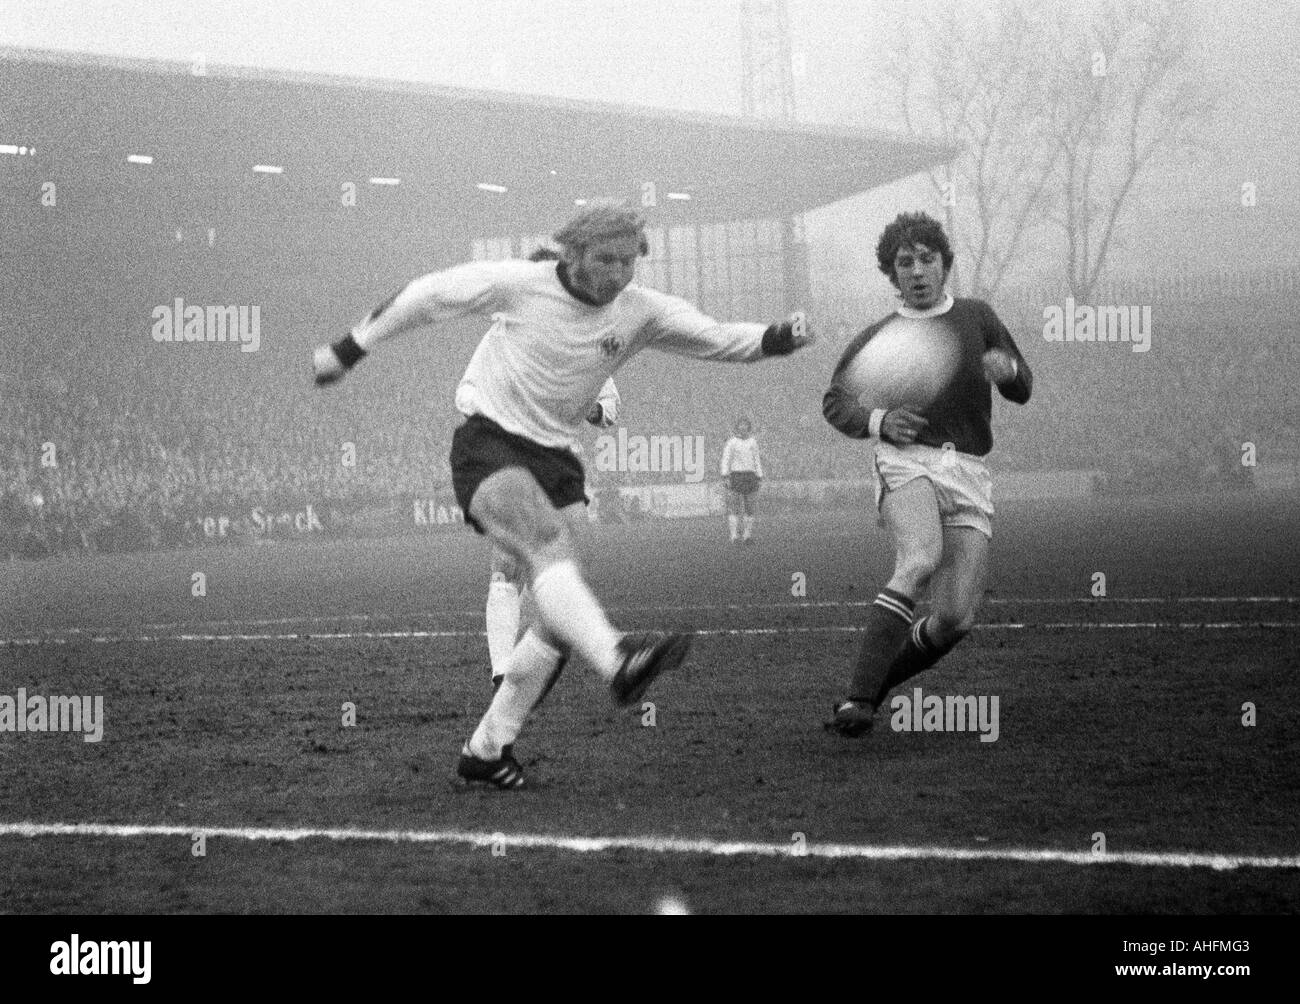 football, Bundesliga, 1971/1972, FC Schalke 04 versus Eintracht Frankfurt 2:0, Glueckaufkampfbahn Stadium in Gelsenkirchen, scene of the match, clearance of Horst Heese (Frankfurt) left before Klaus Fischer (S04) - Stock Image